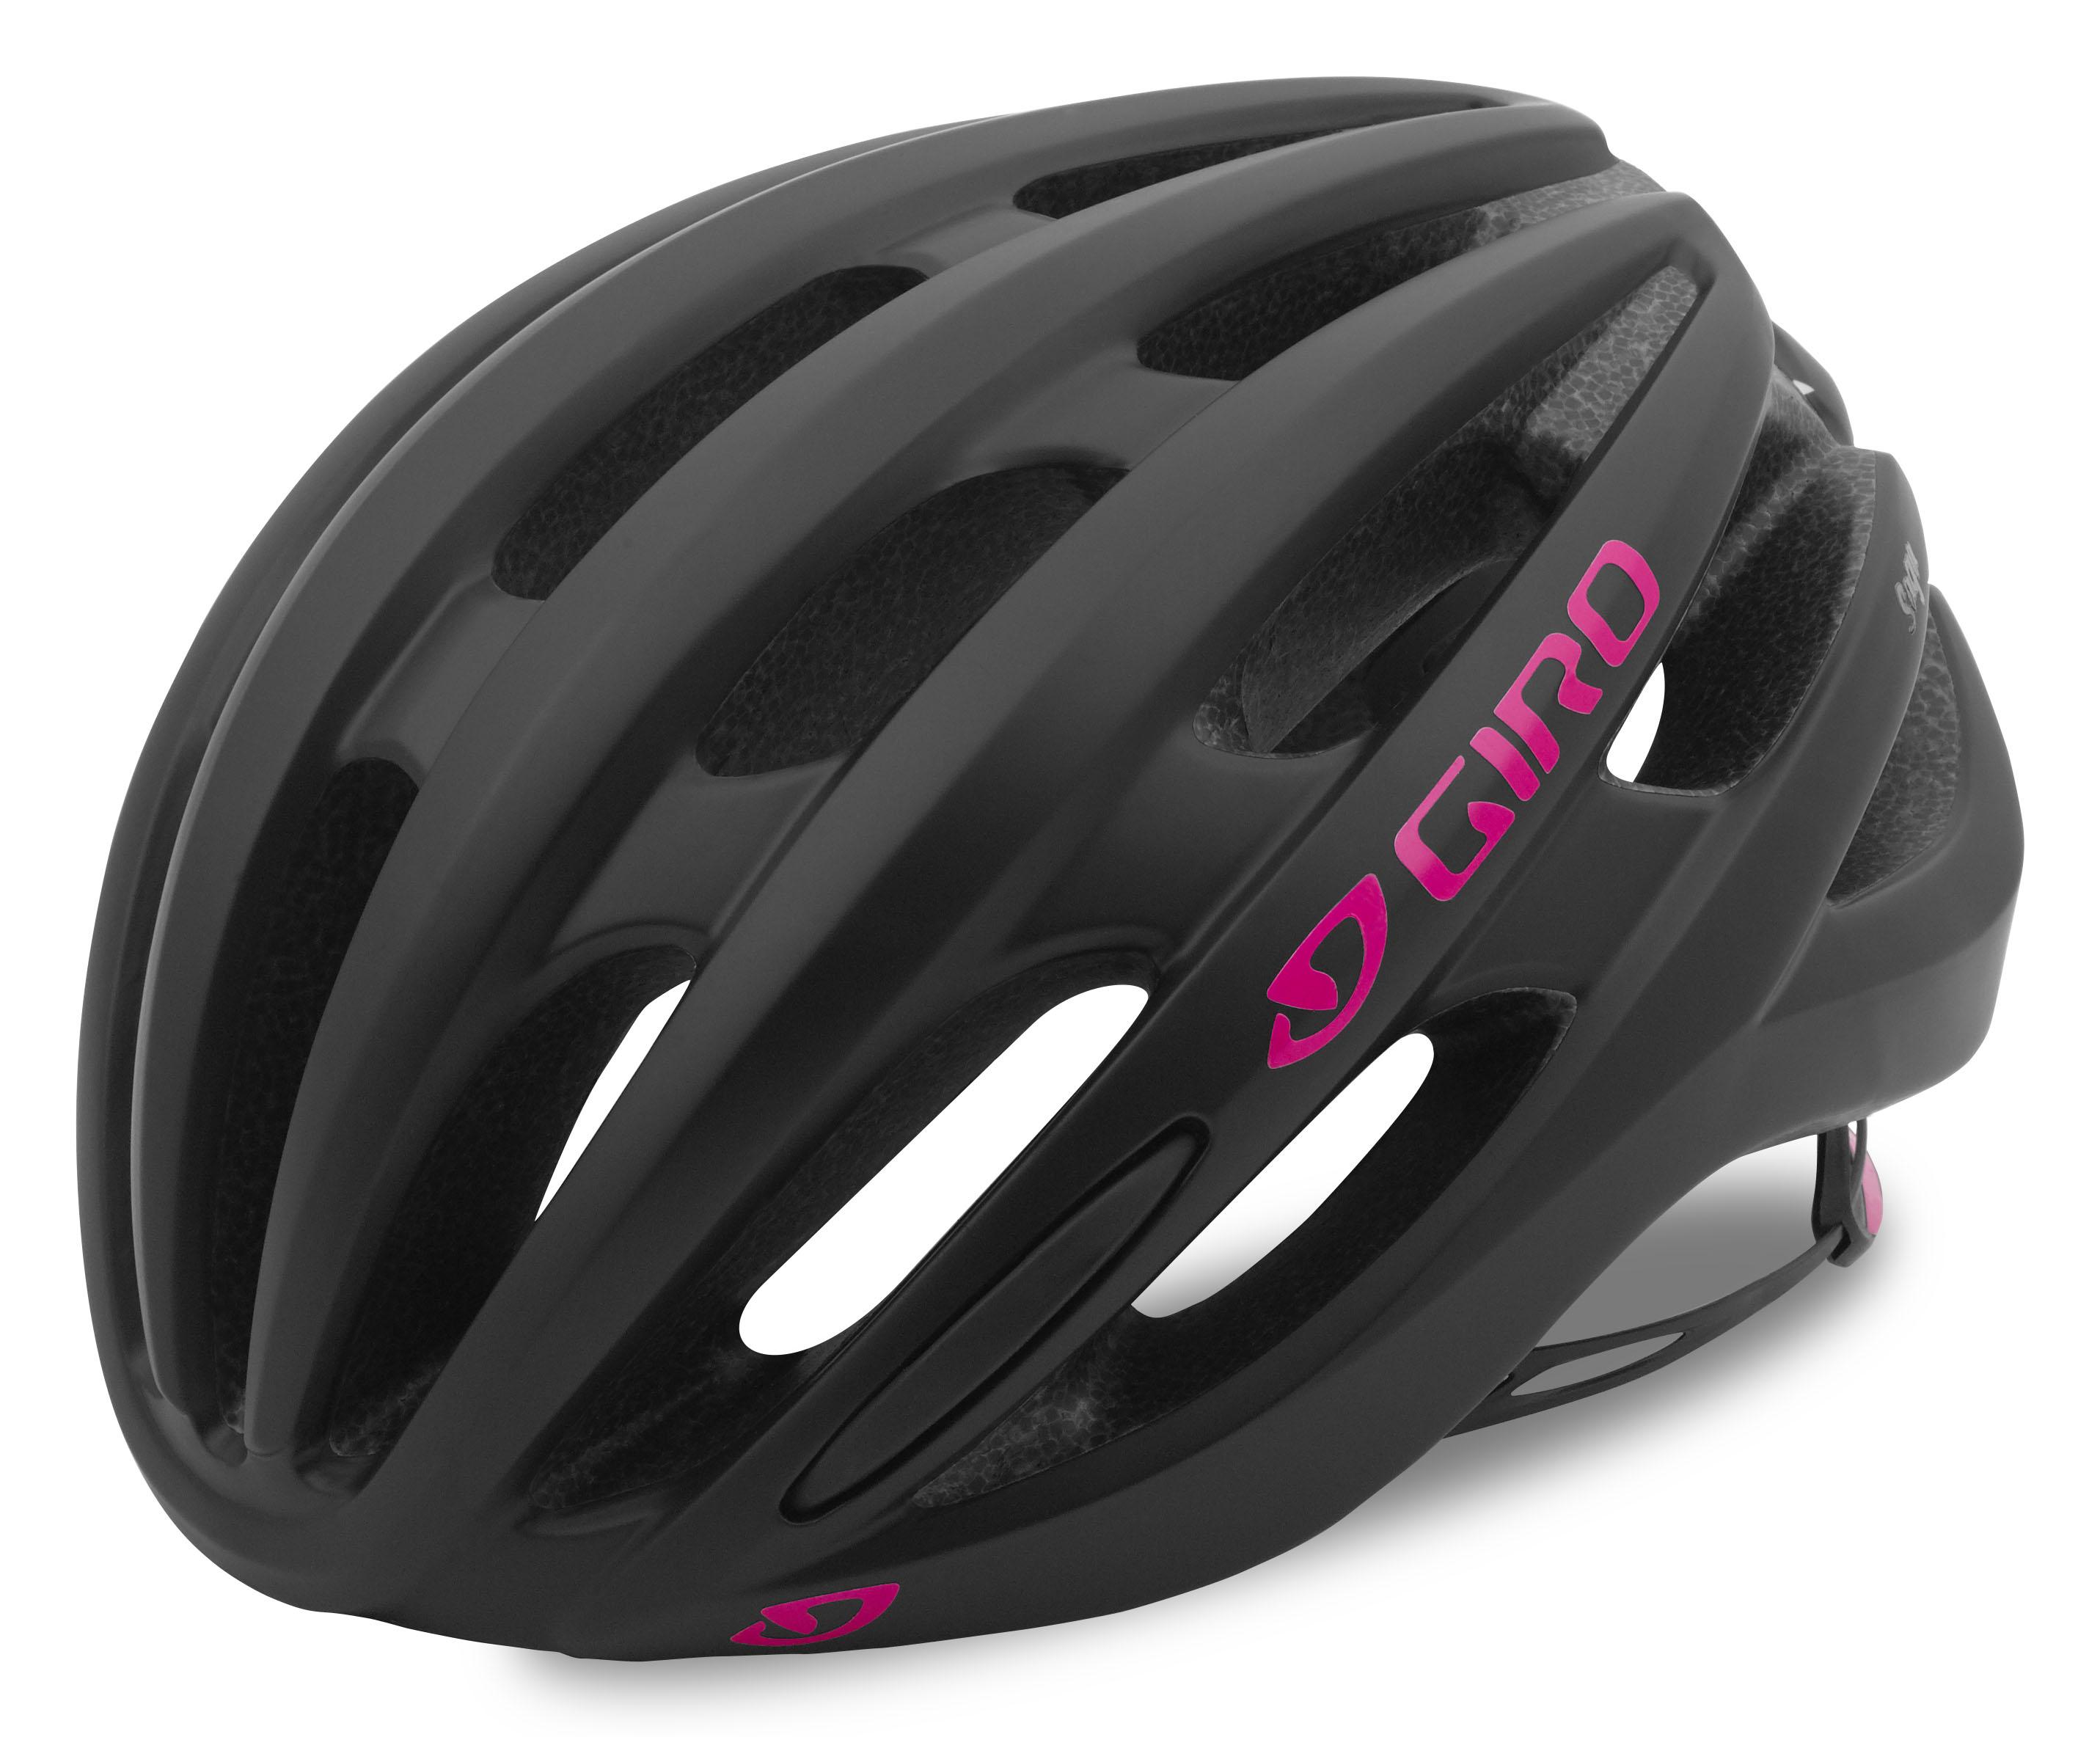 Giro cykelhjelm Saga Mat Sor/lys Pink M Women M/55-59cm | Helmets